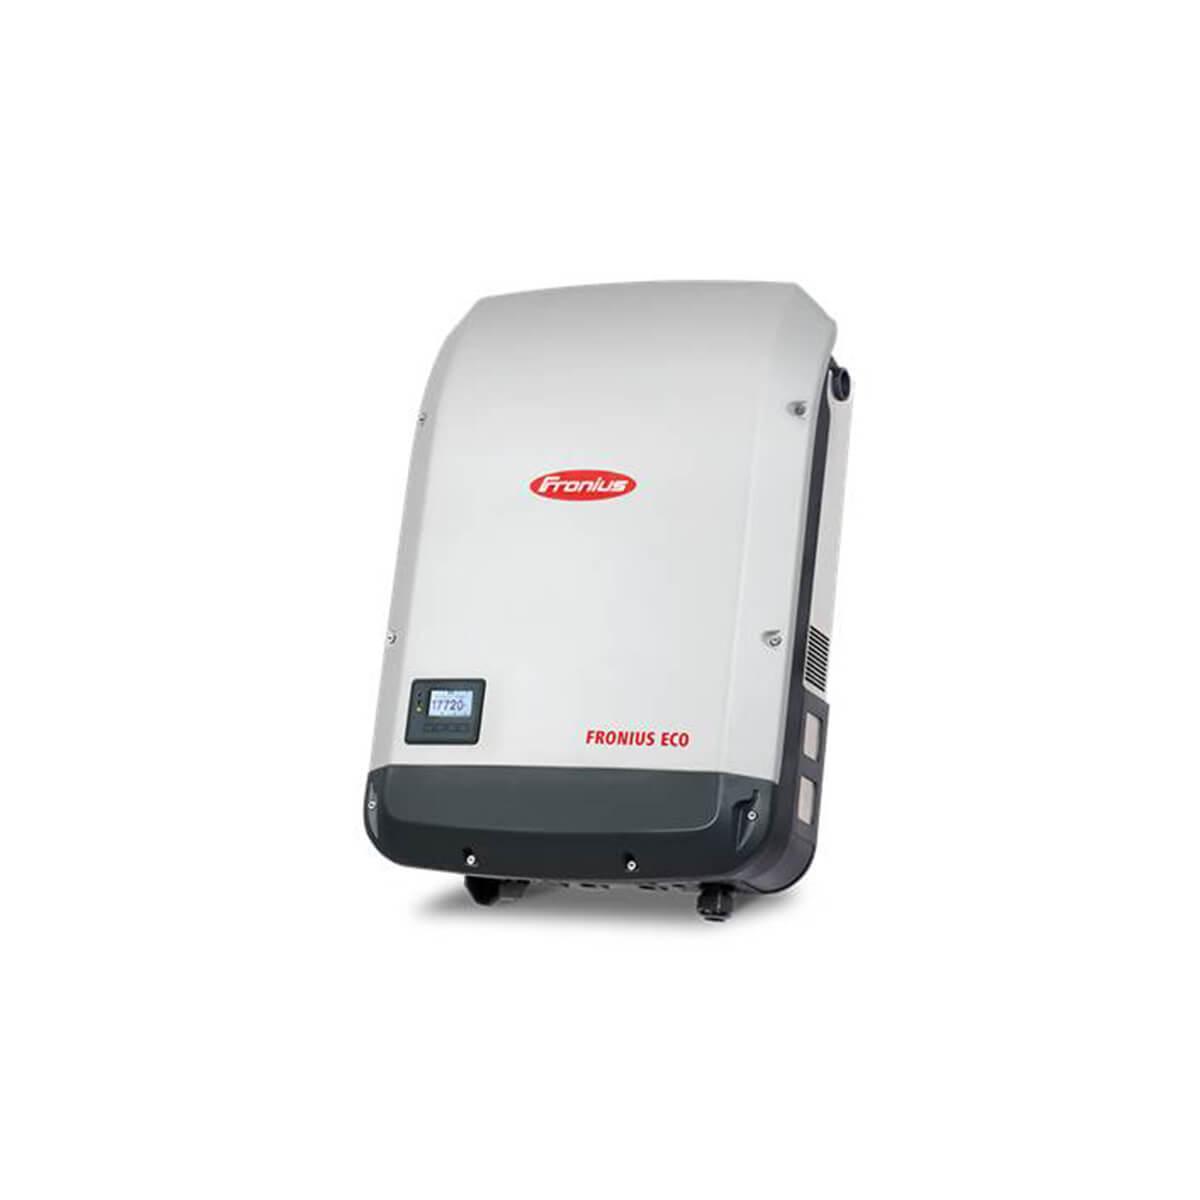 fronius 25kW inverter, fronius eco 25kW inverter, fronius eco 25.0-3-s inverter, fronius eco 25.0-3-s, fronius eco 25 kW